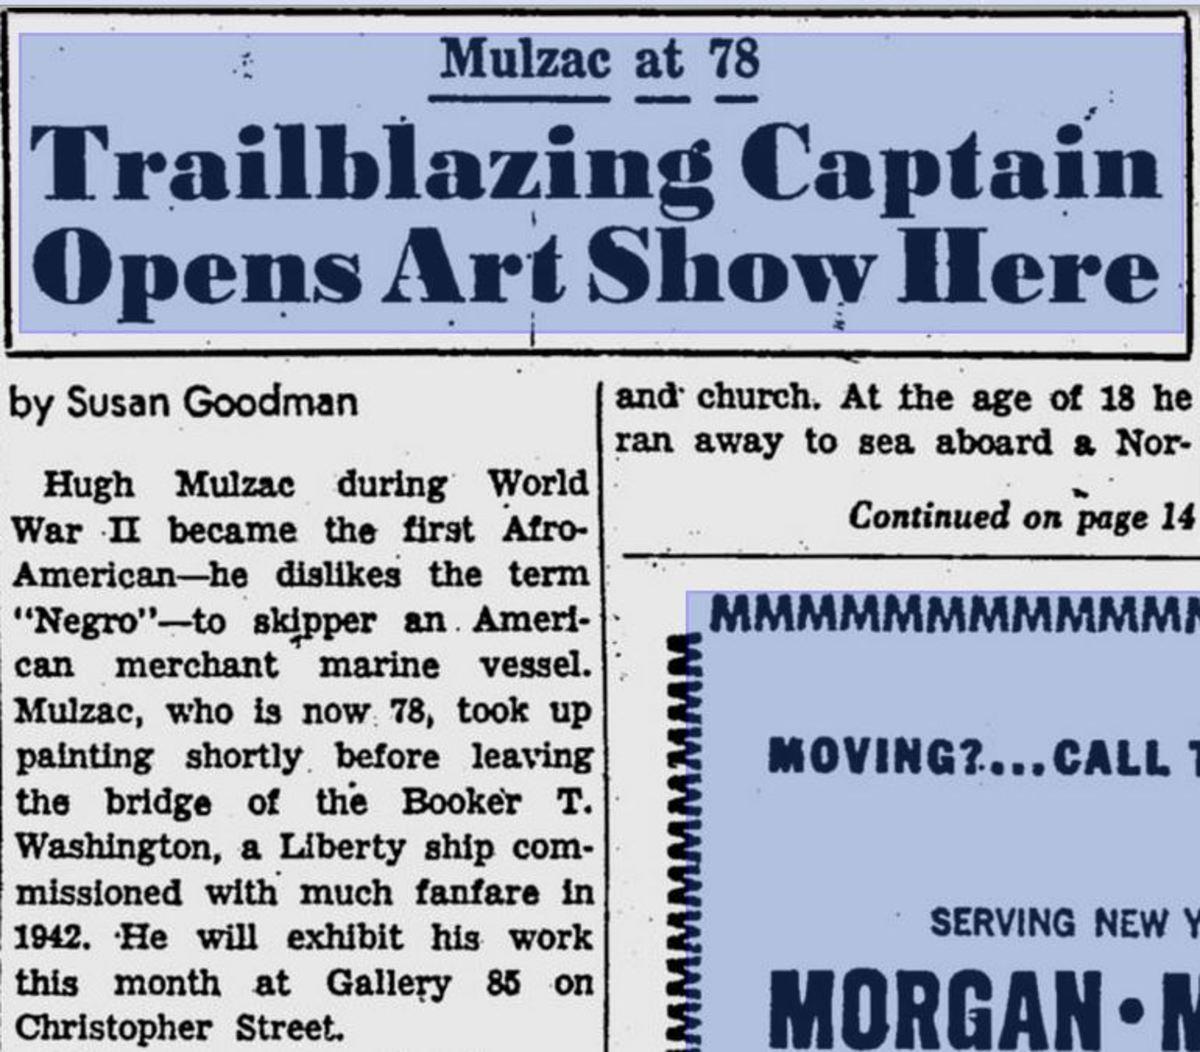 Captain Mulzac Opens Art Show